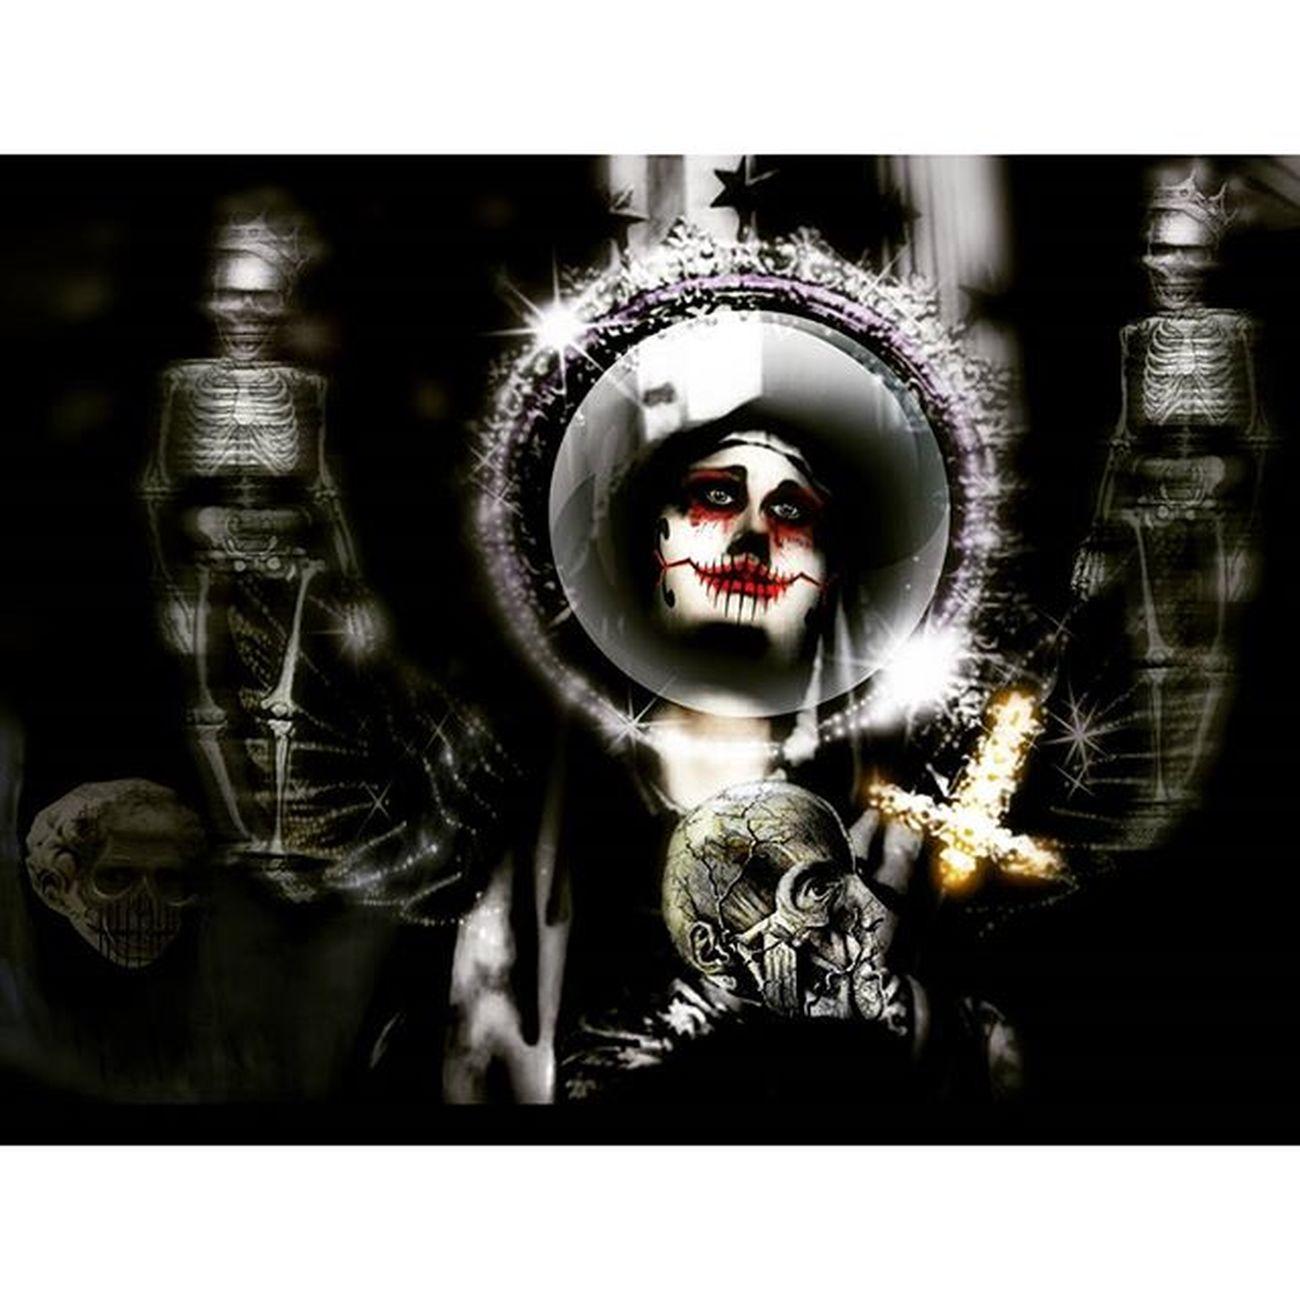 Digitalart  Photomanipulation Conceptart Digitalartwork Loves_edits Ominous_perfection _mastersofdarkness_ Dark_portraits Darkart Skulls Photoart